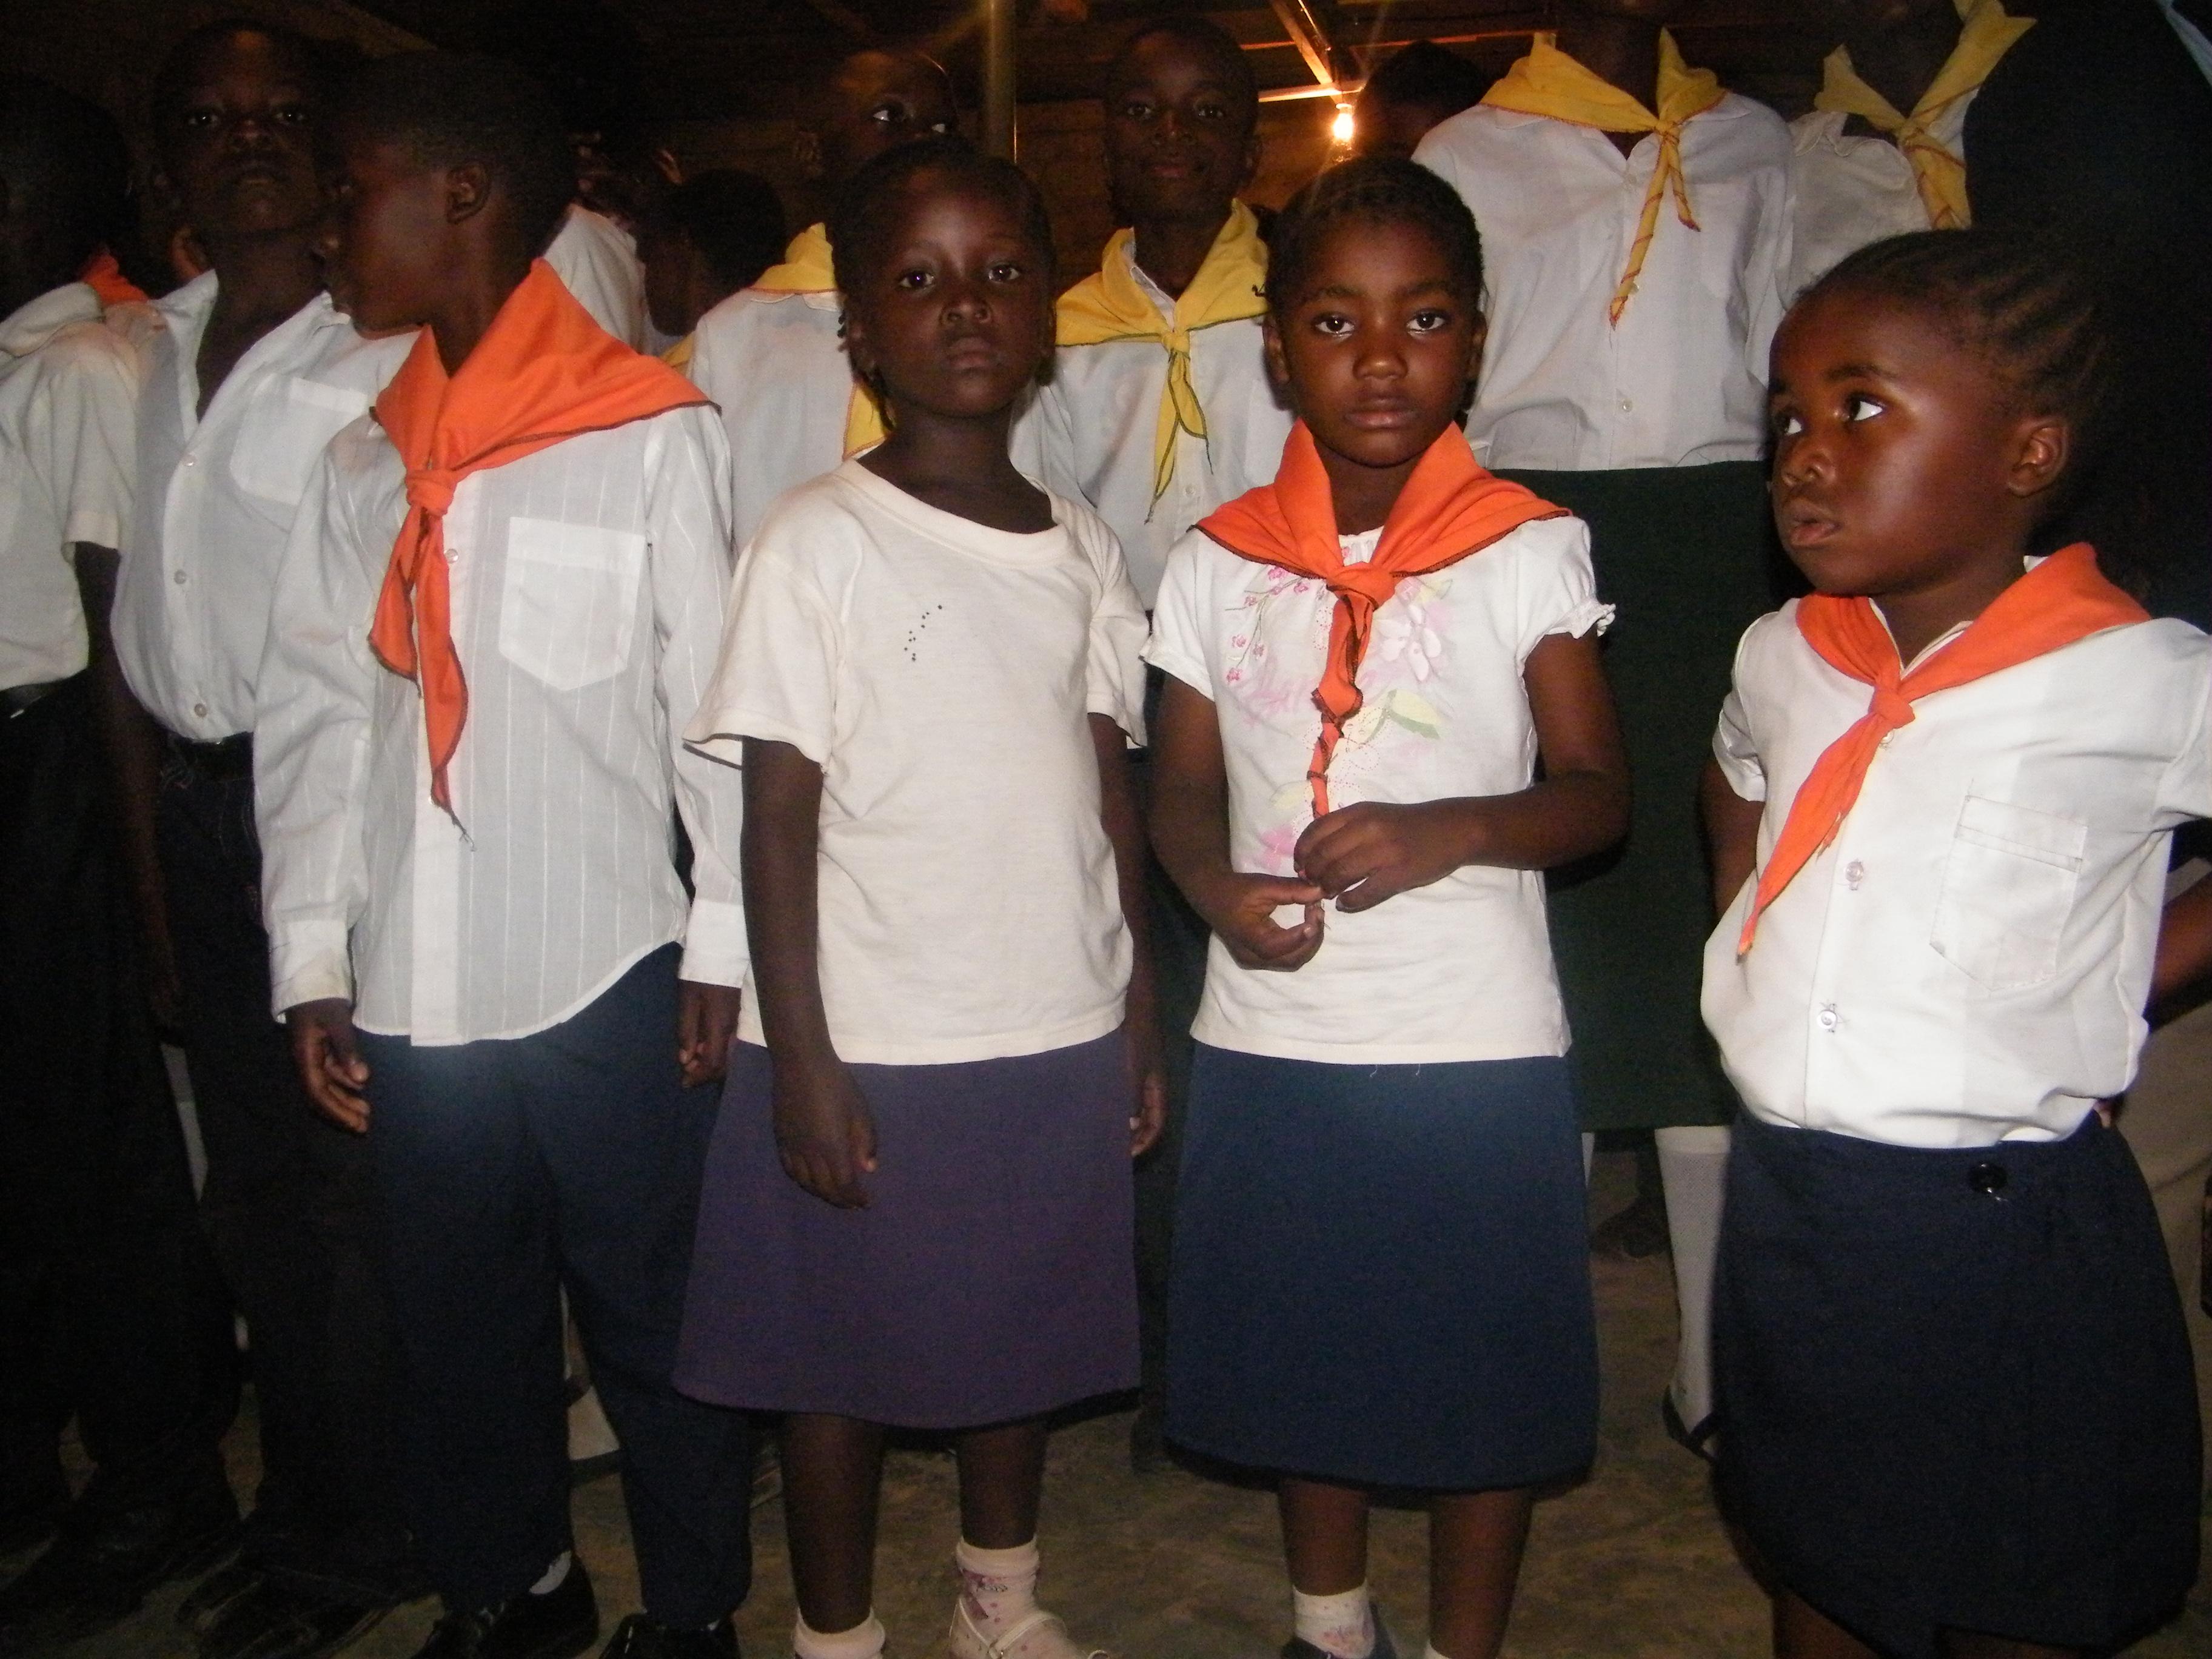 Massmedia SDA Church - News: Adventist Youth Ministries